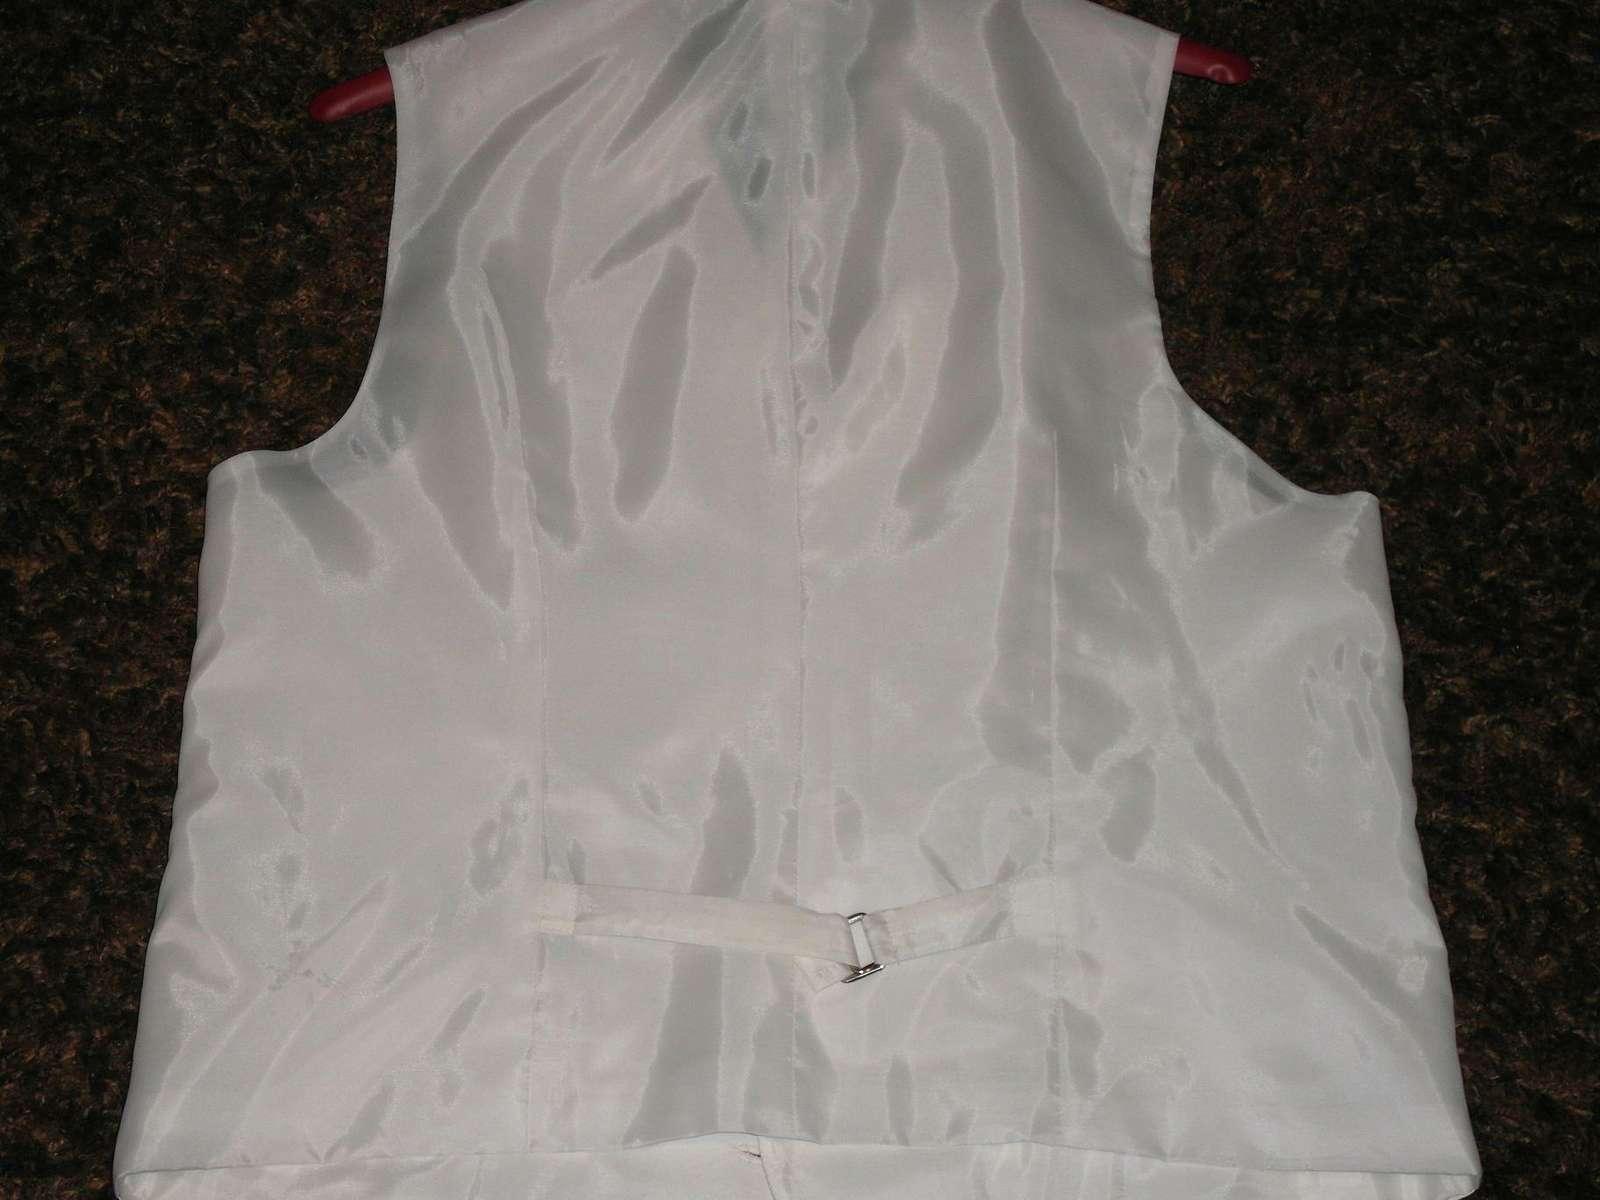 Biela leskla vesta s kravatou - Obrázok č. 2